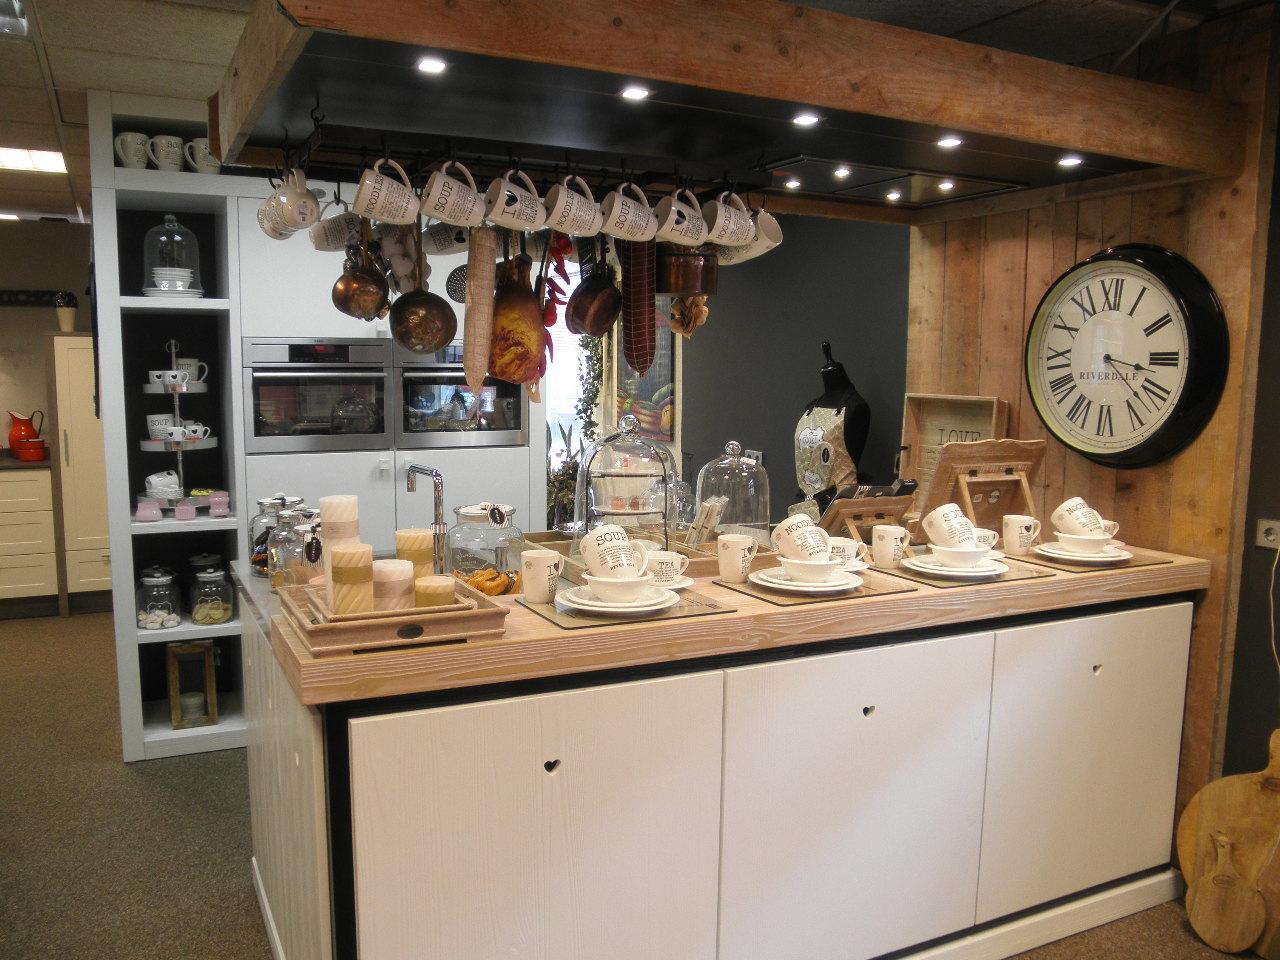 Riverdale keuken met servies